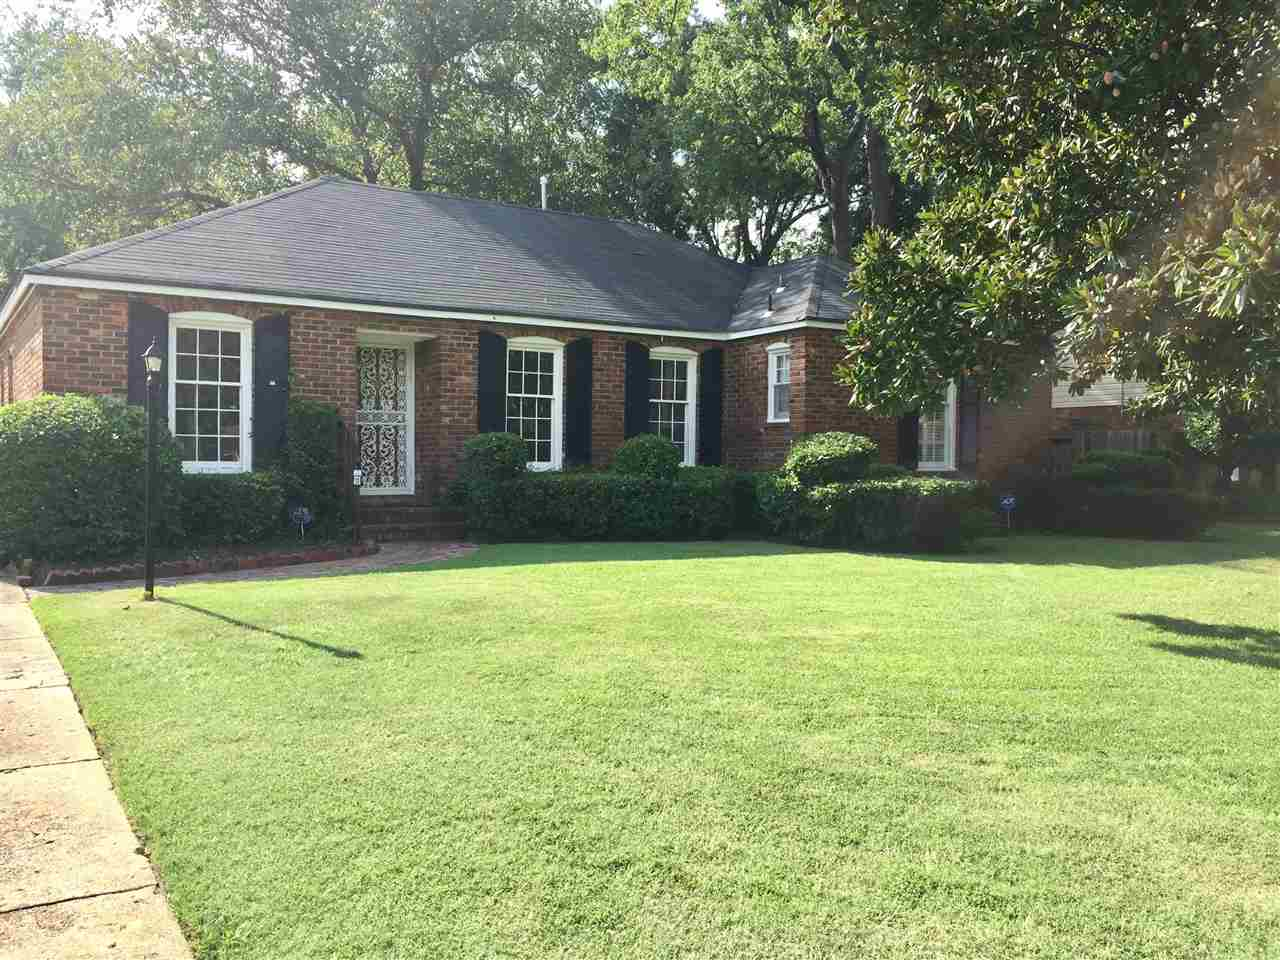 233 N Yates Memphis, TN 38120 - MLS #: 10009858